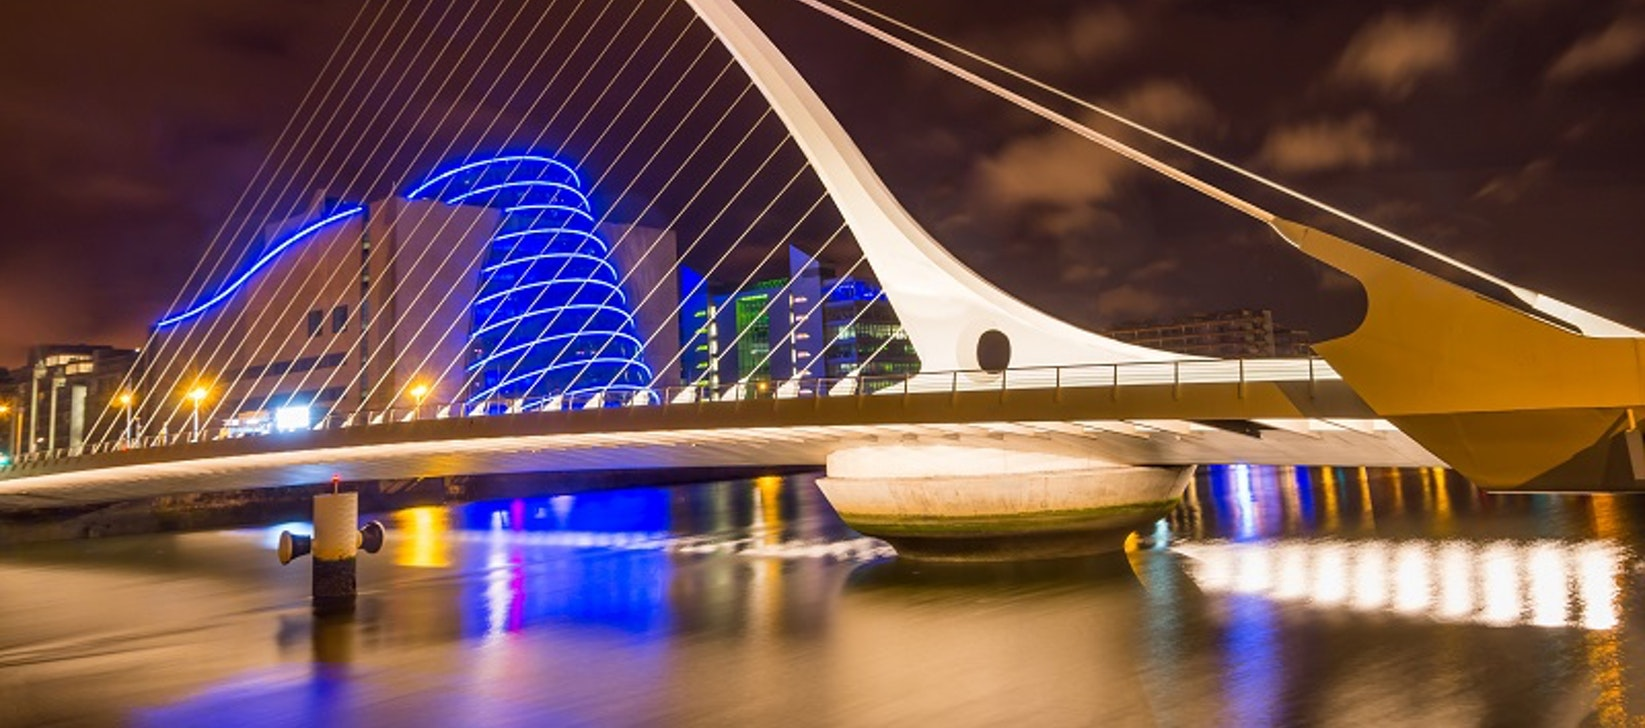 The Dublin regional enterprise strategy 2017-2019